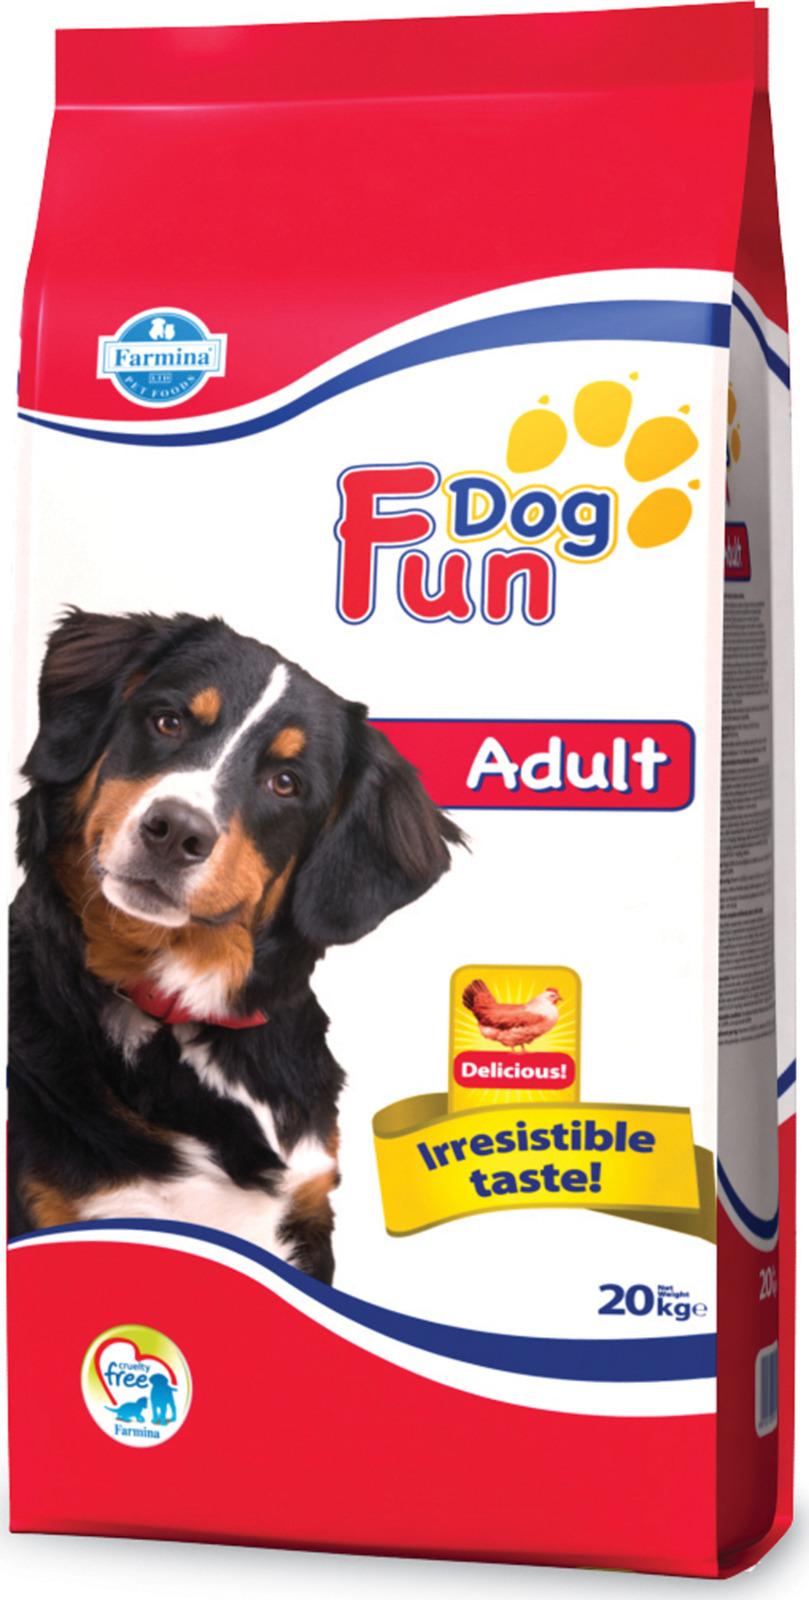 Фото - Корм сухой Farmina Fun Dog, для собак, с курицей, 20 кг farmina farmina fun dog adult